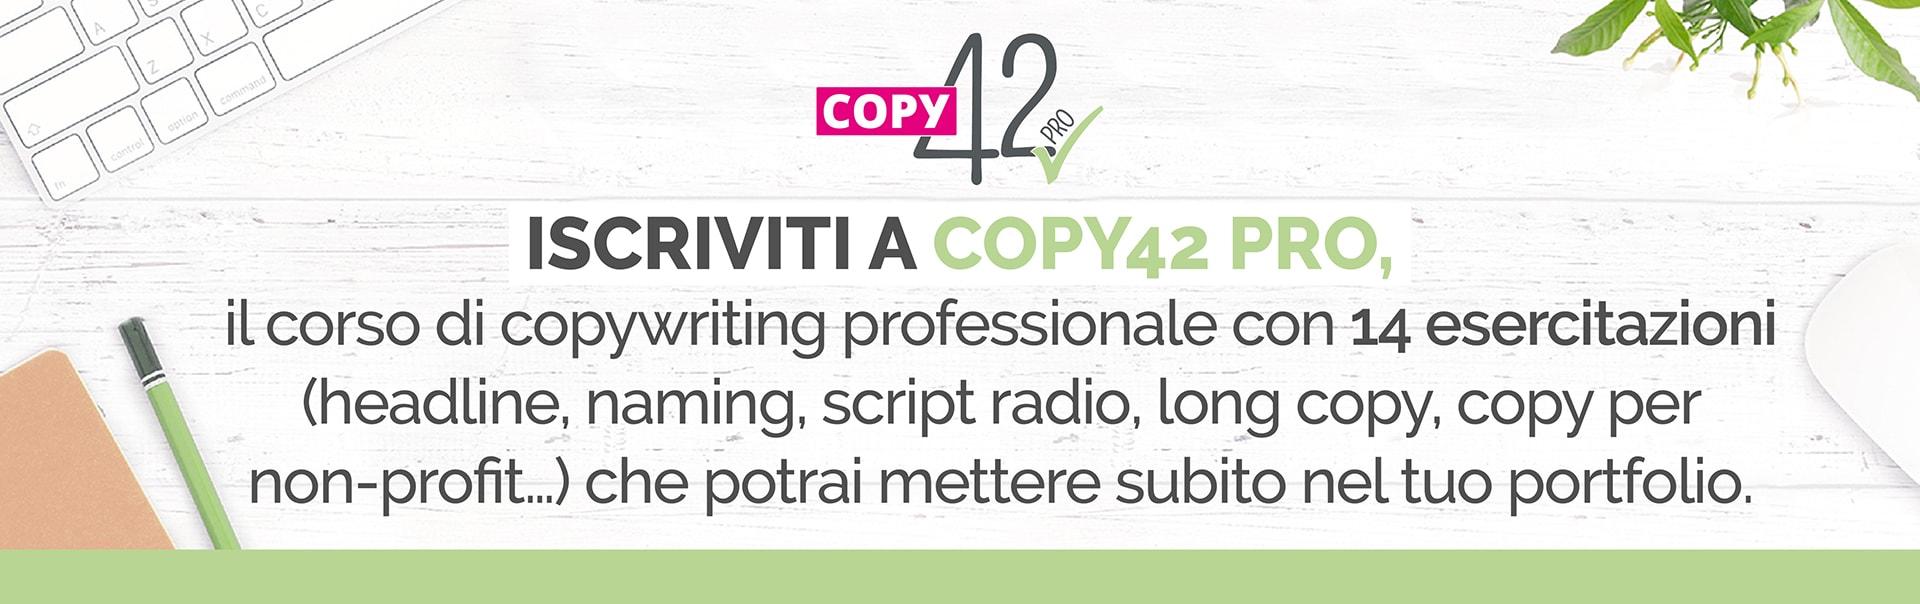 Copy42 i corsi per copywriter